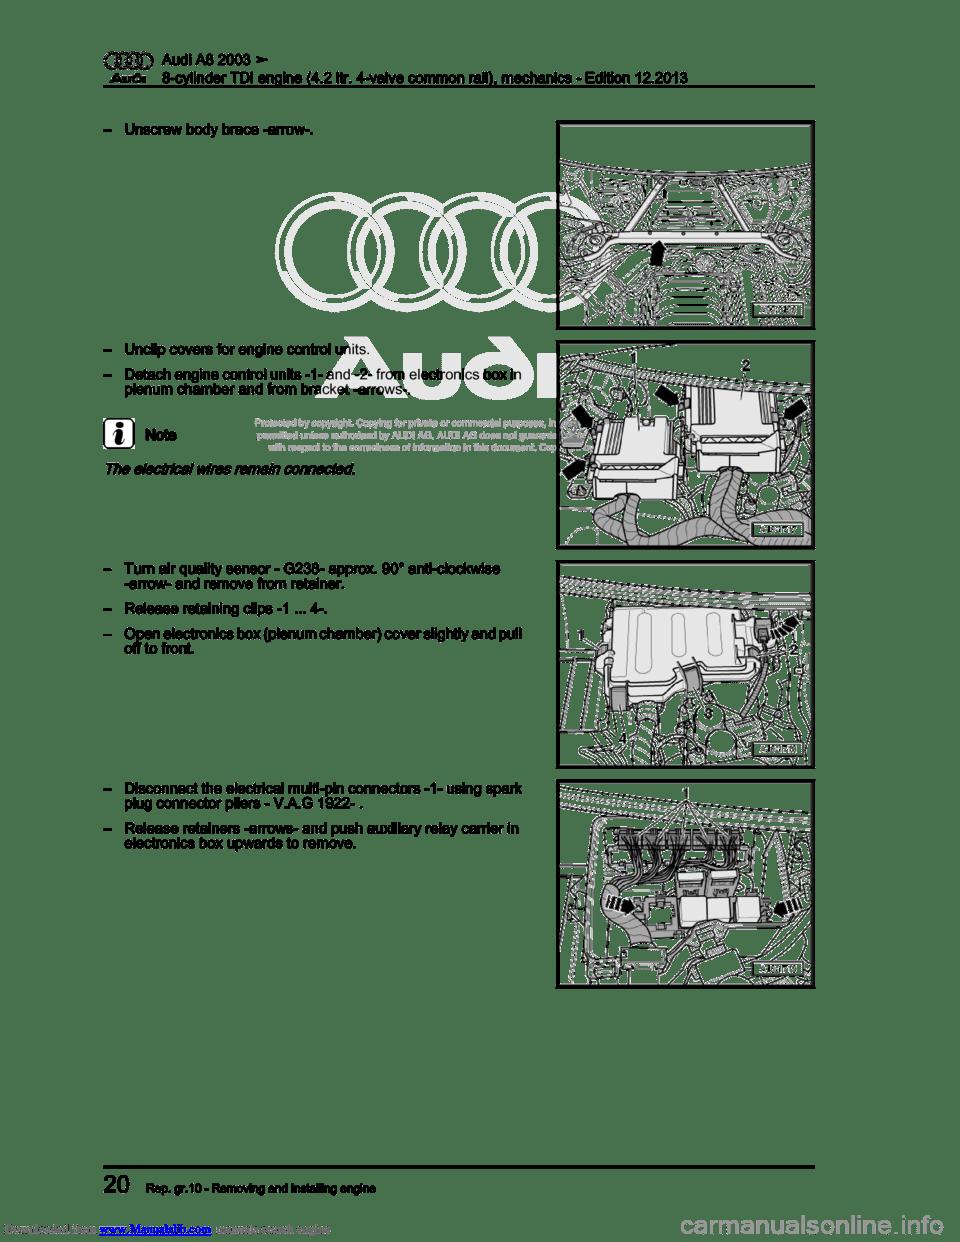 AUDI A8 2003 D3 / 2.G BVN BMC Engines Workshop Manual